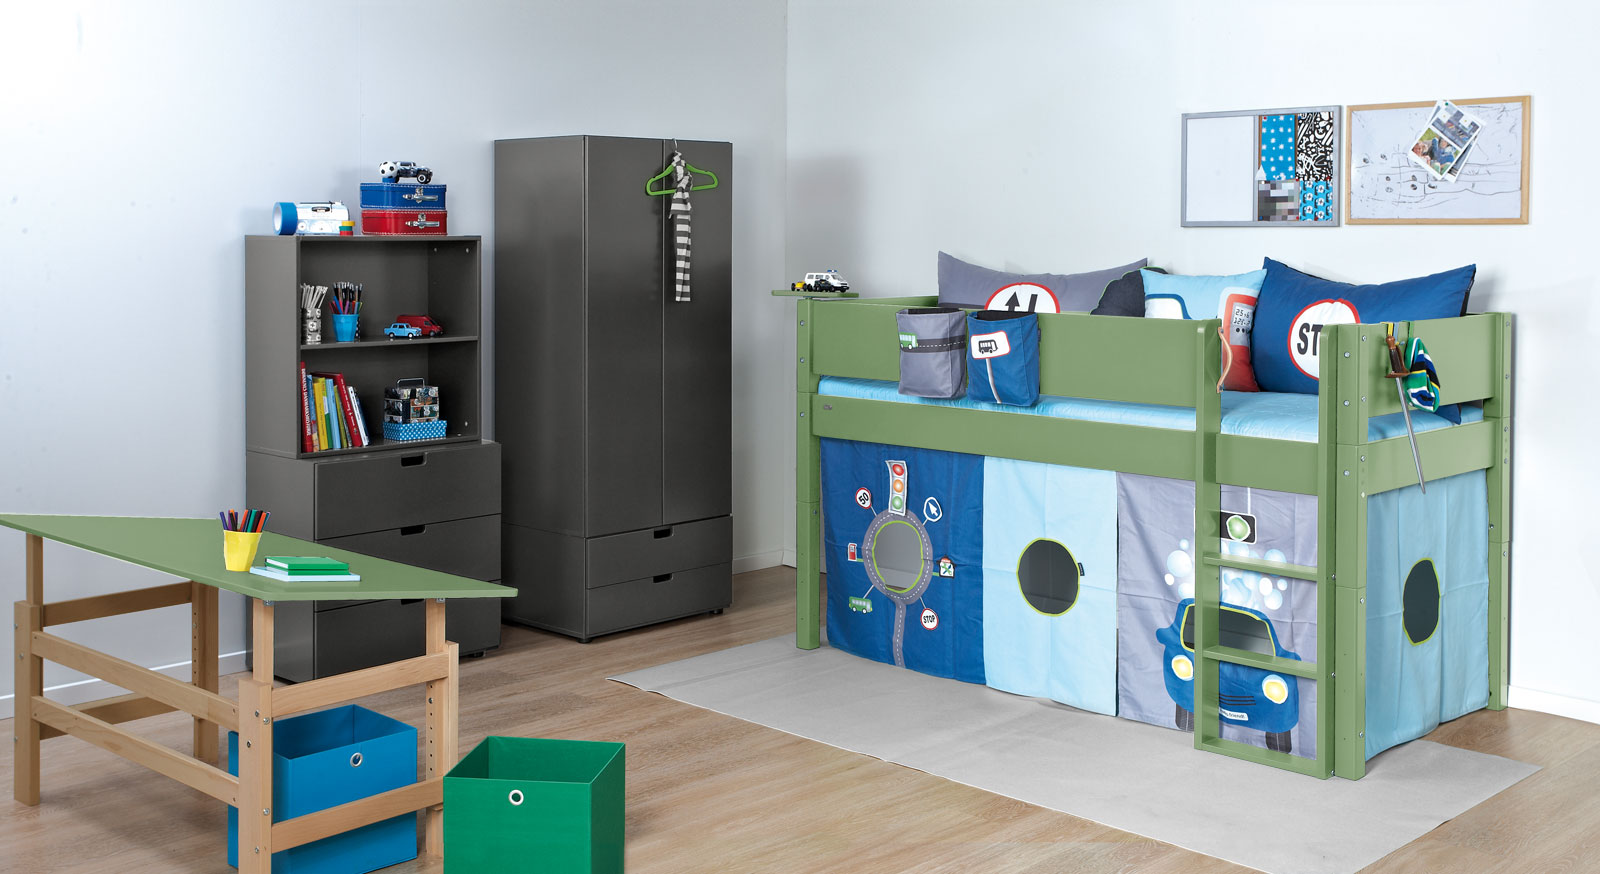 Passende Produkte zum Mini-Hochbett Kids Town Color